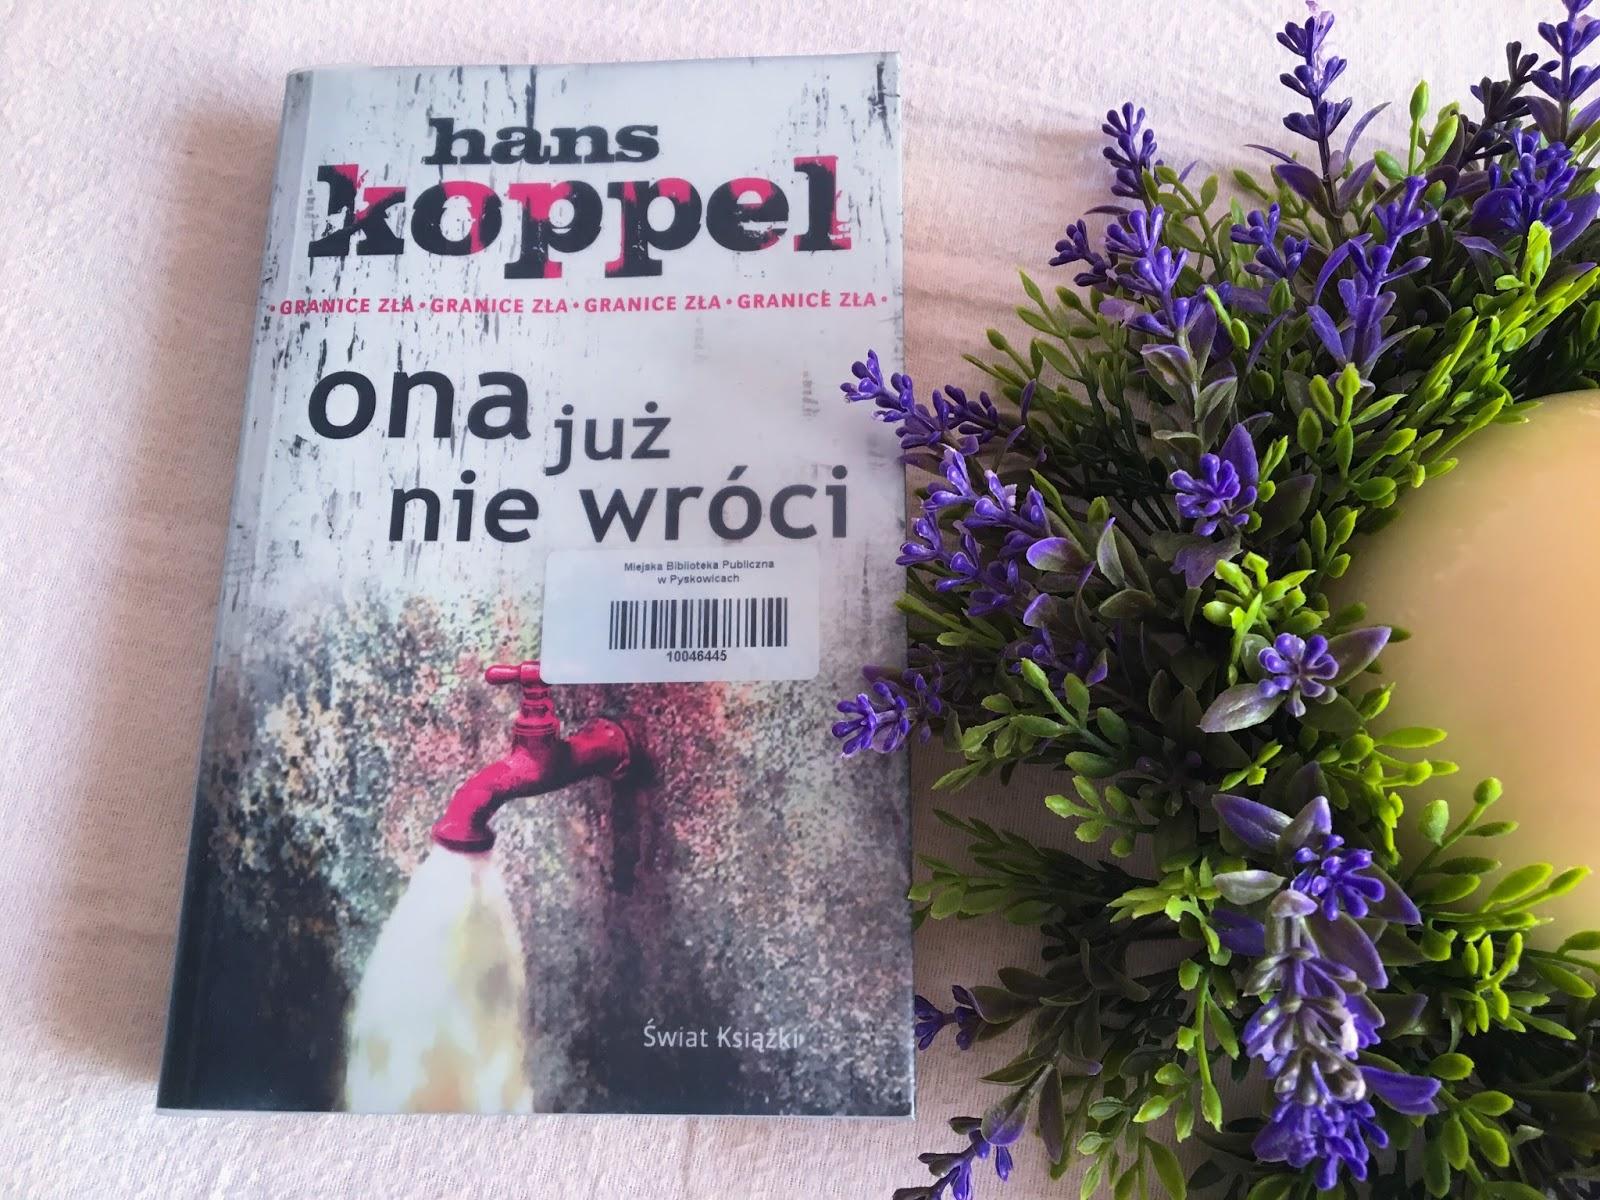 Ona już nie wróci - Hans Koppel